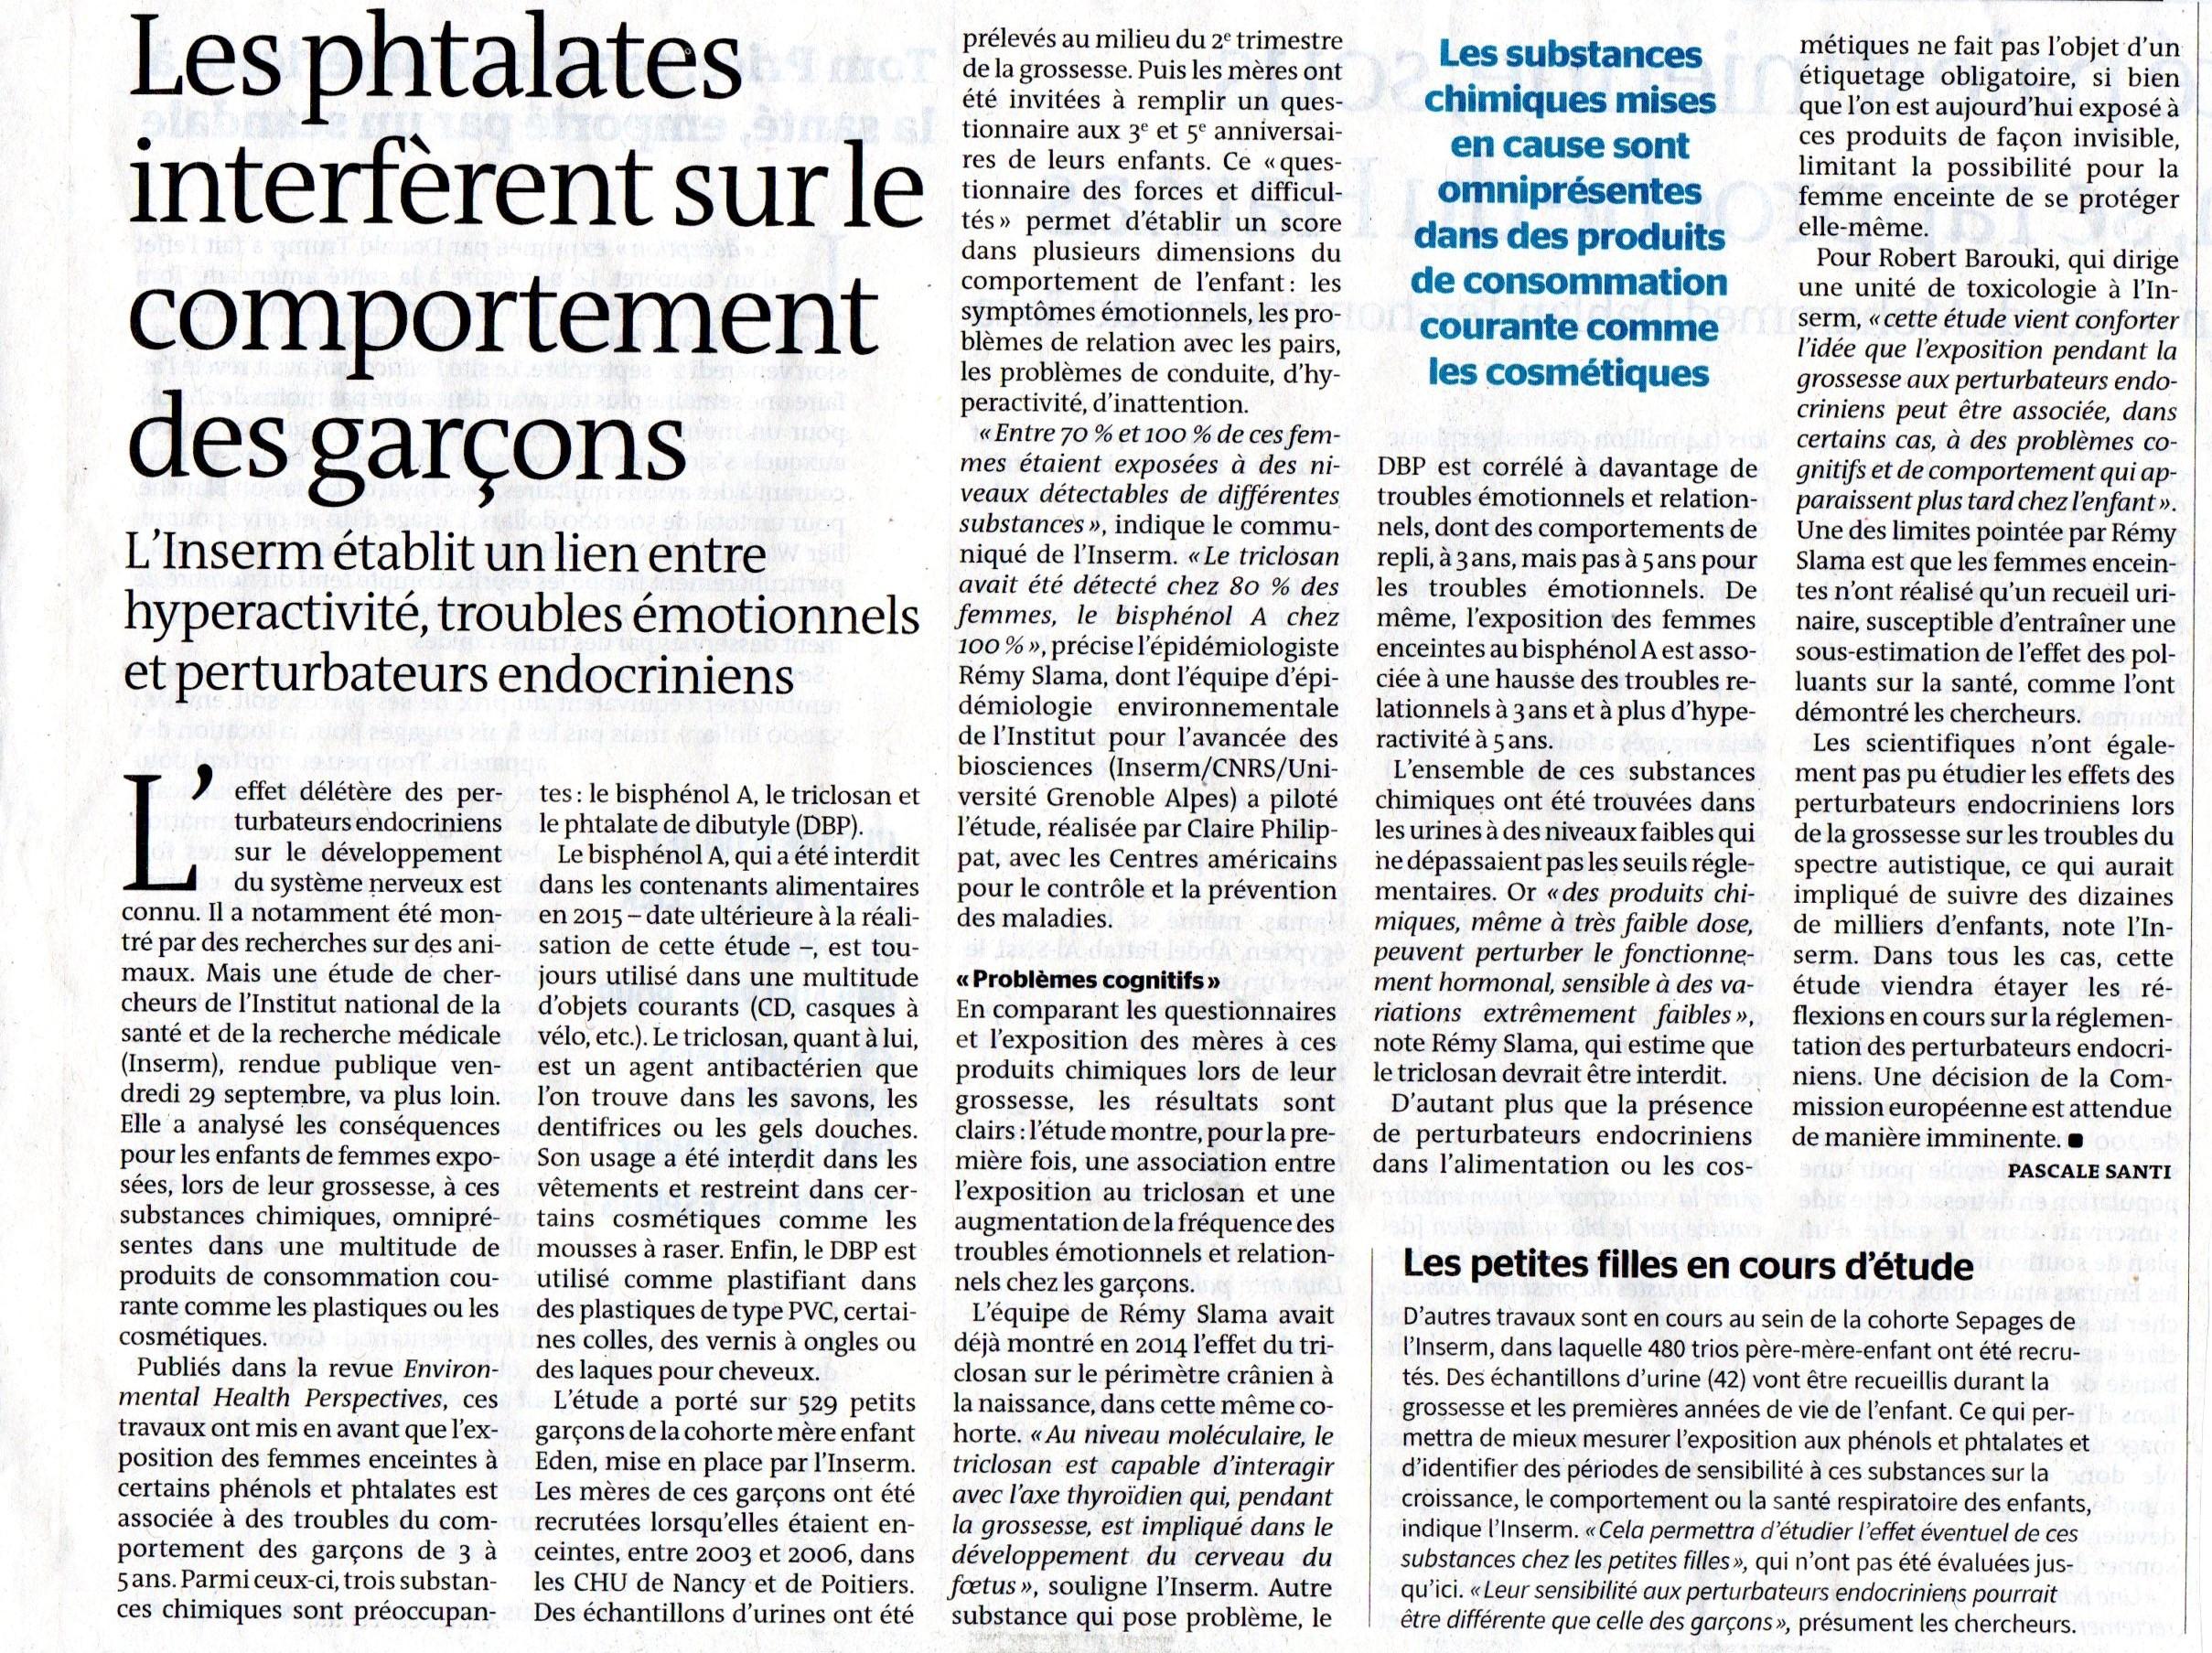 Etude INSERM sur phtalates - Le Mode, oct 2017027